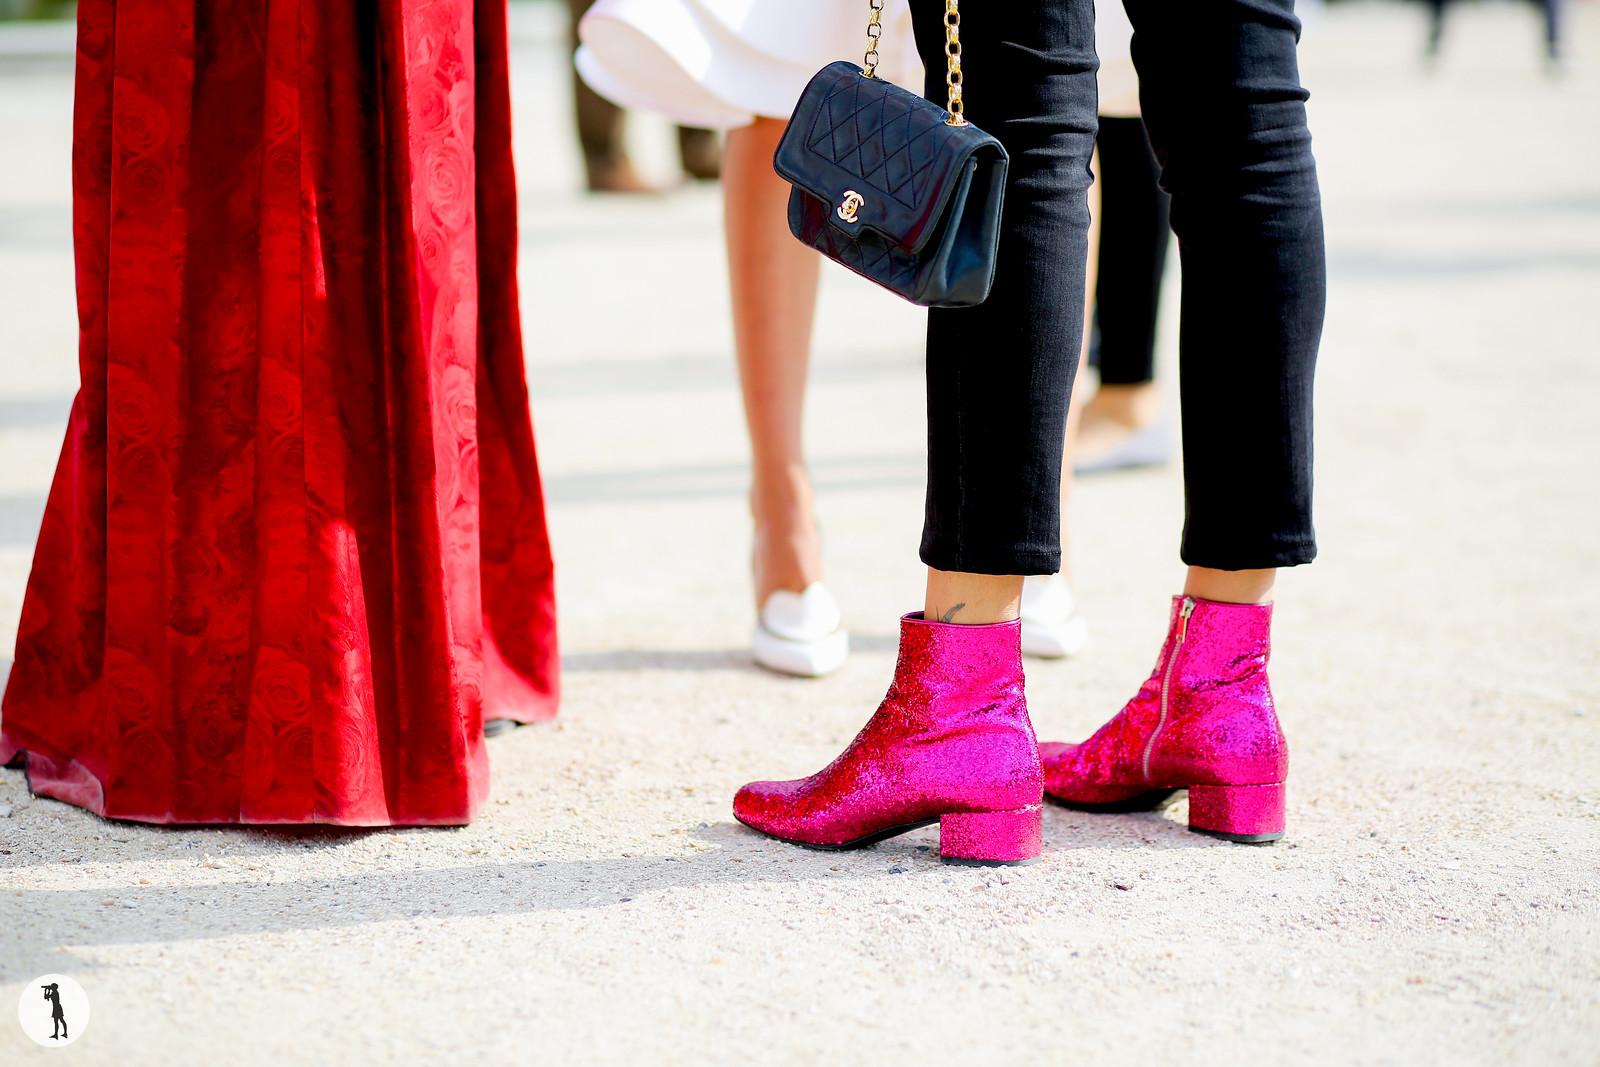 Close-up - Paris fashion week RDT SS15 (1)